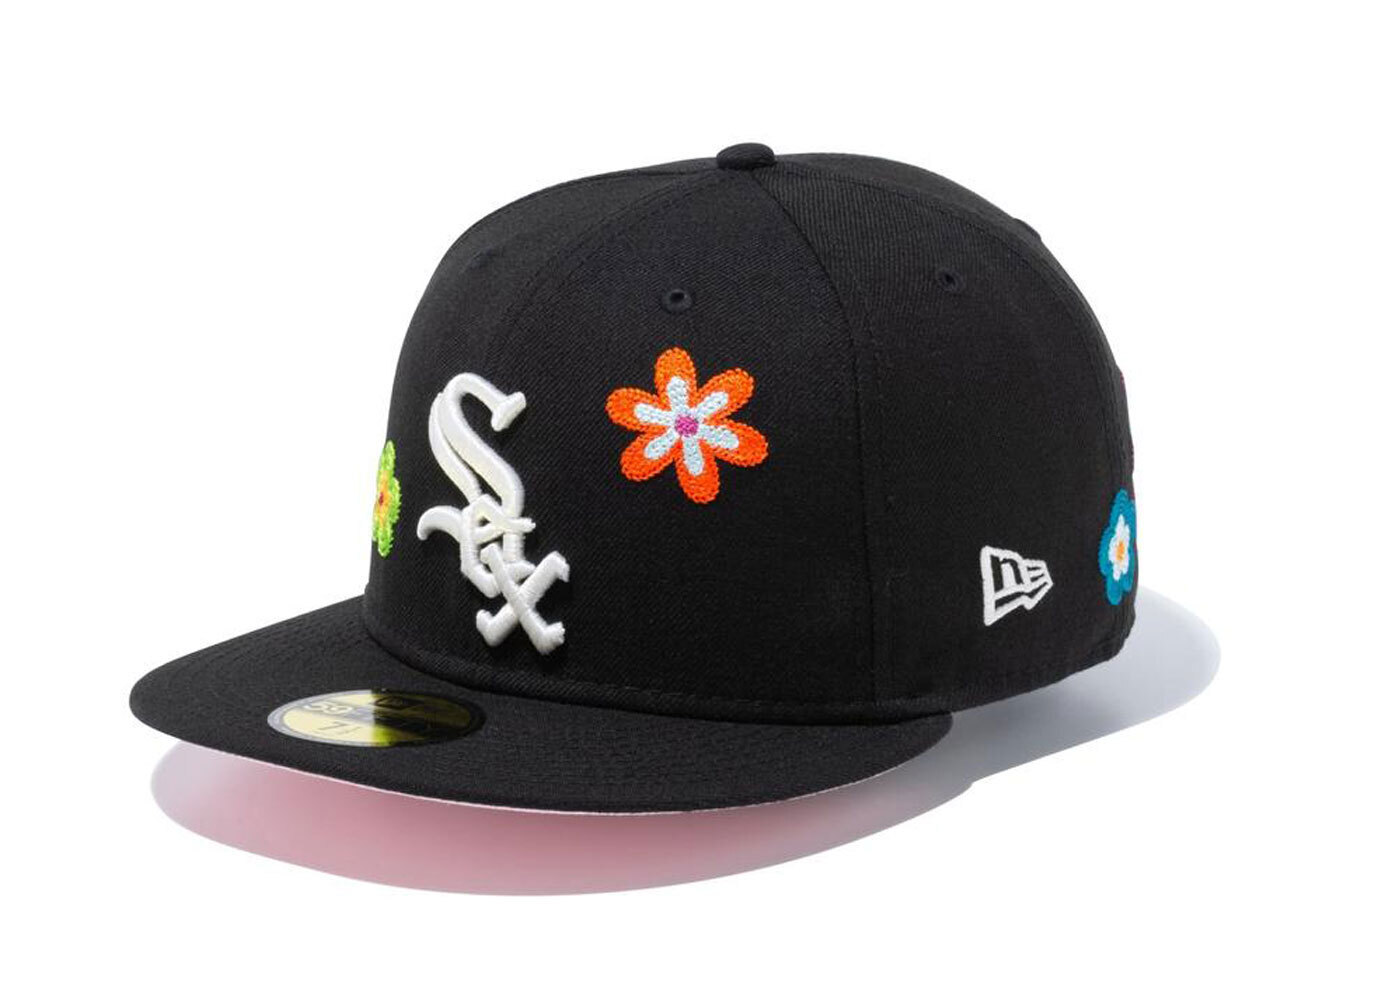 New Era 59FIFTY Chain Stitch Floral Chicago White Sox Pink Under Visor Blackの写真